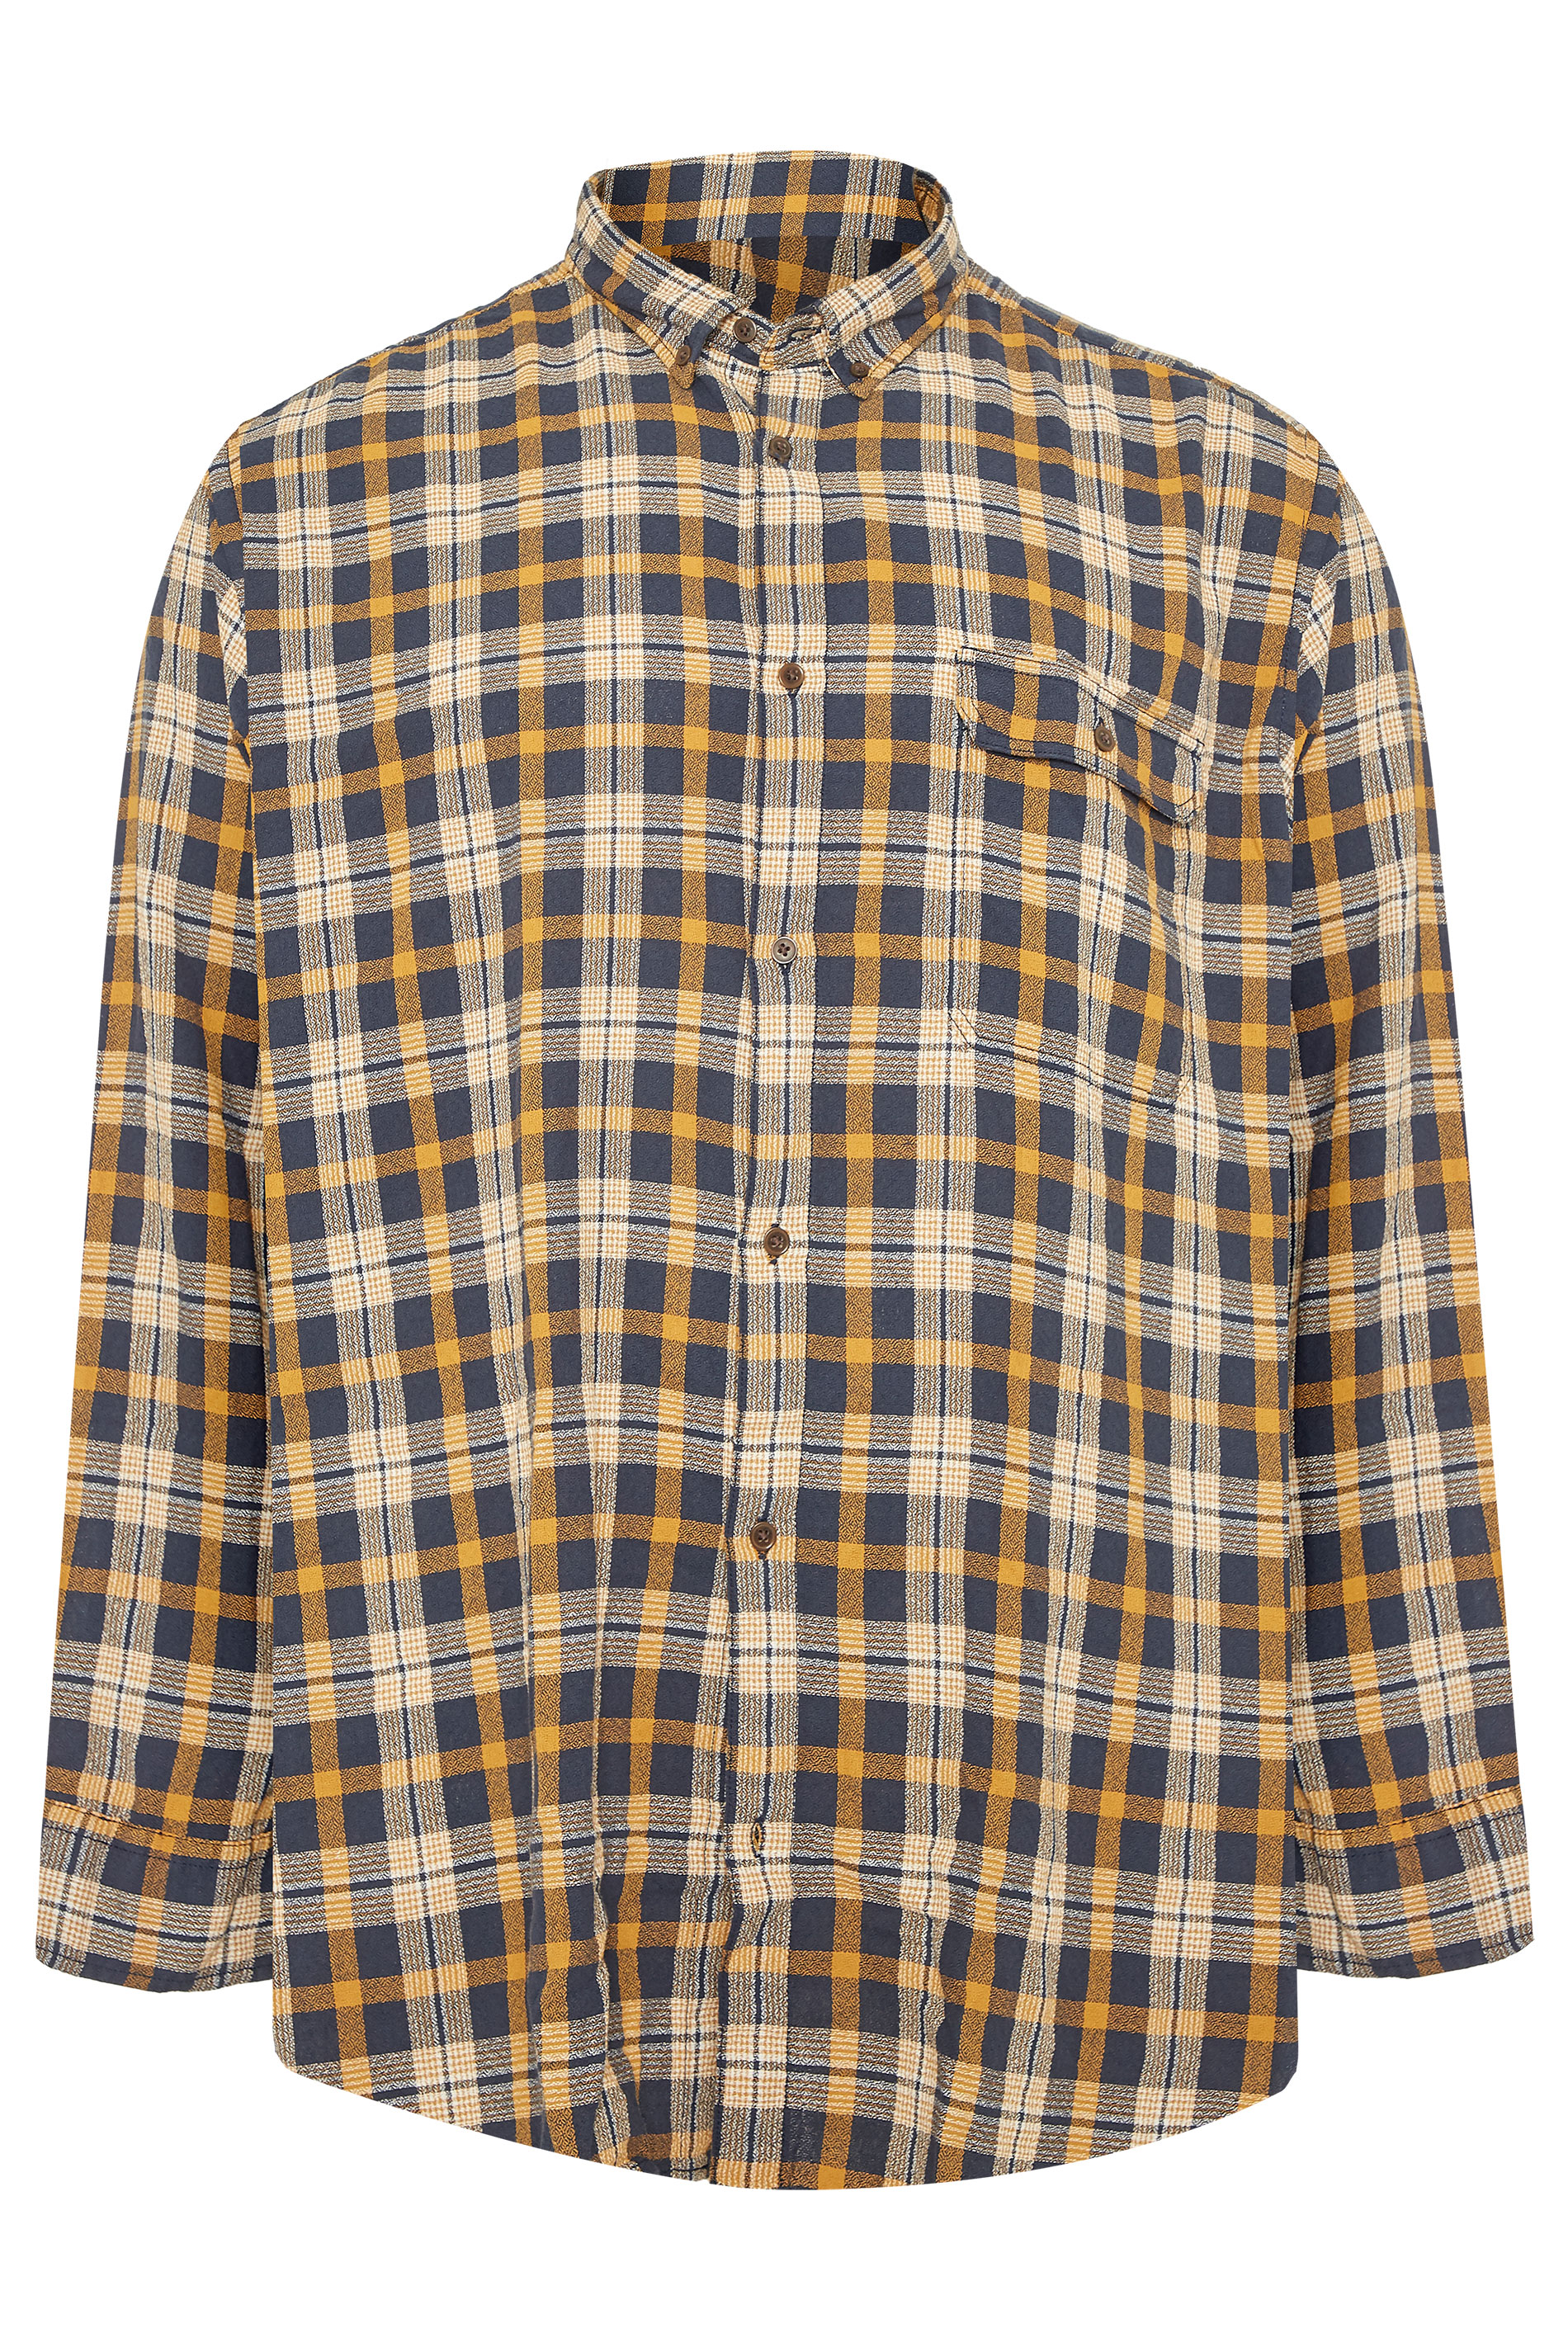 JACK & JONES Rust Orange Emmerson Check Shirt